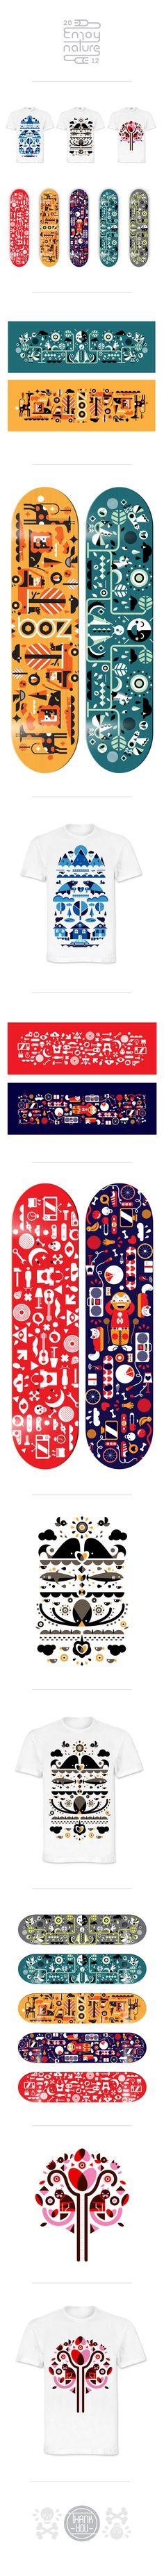 Skateboard designs 2012 by Adam Quest, via Behance